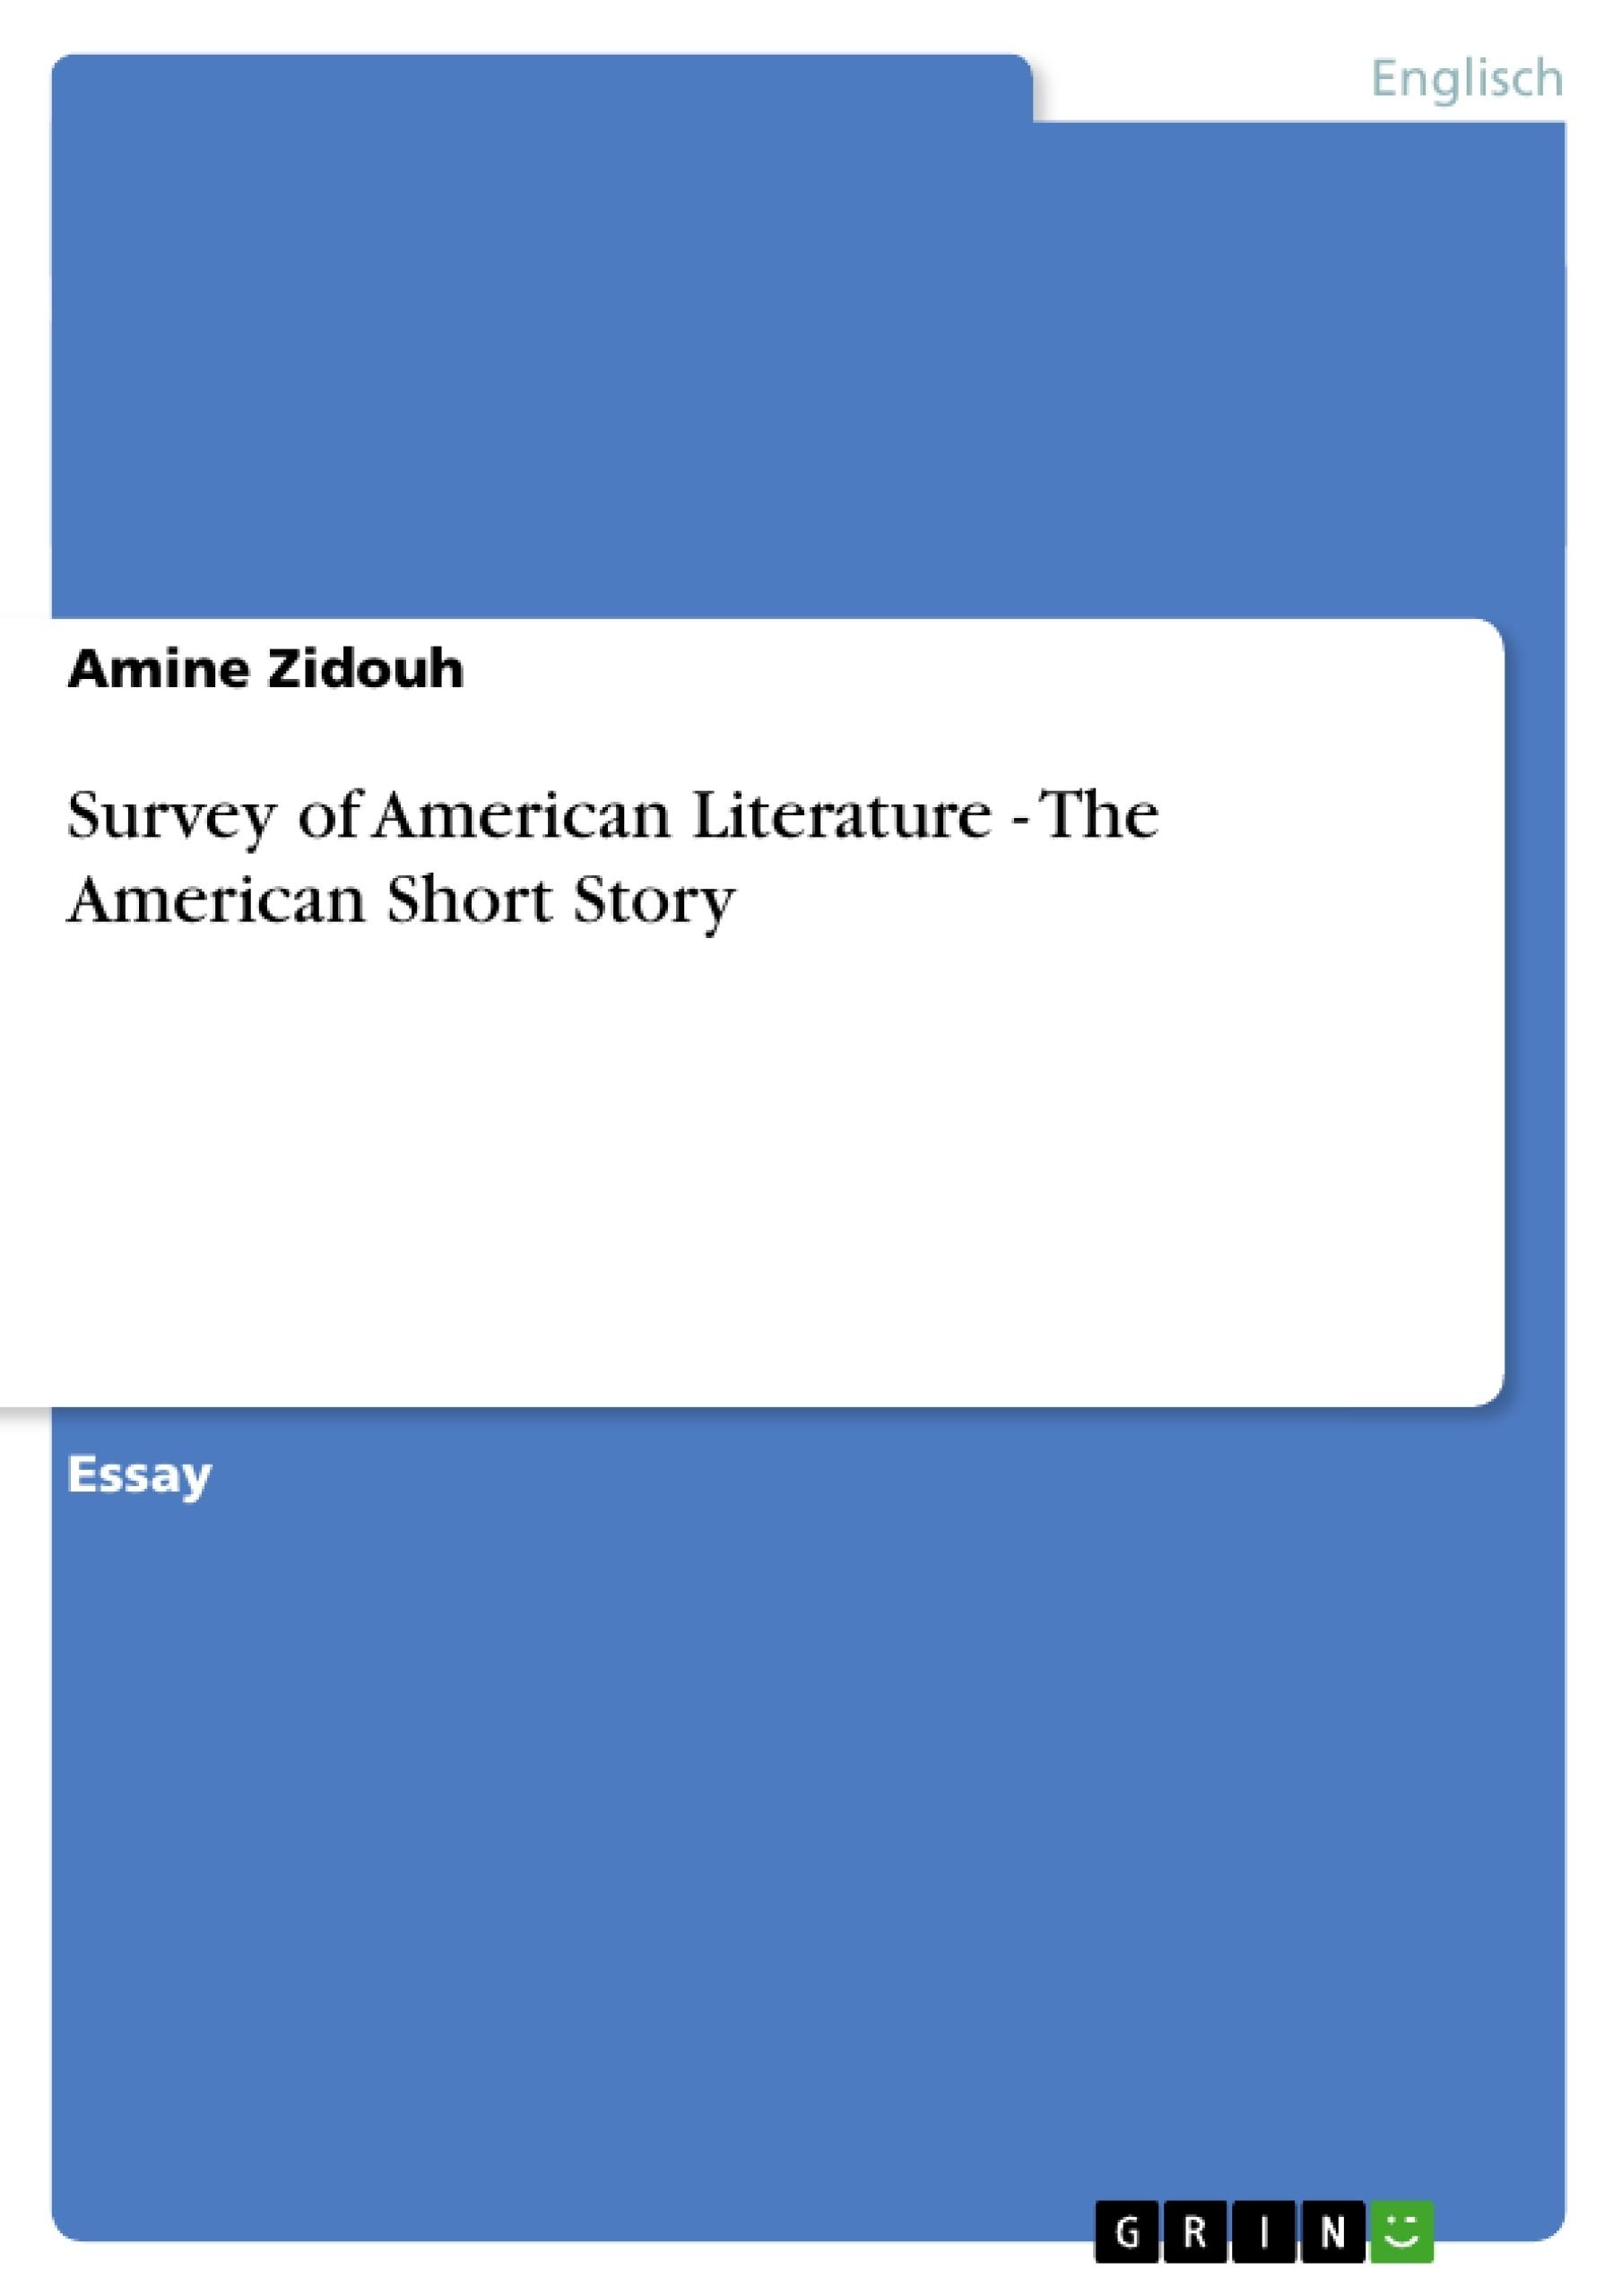 Titel: Survey of American Literature - The American Short Story